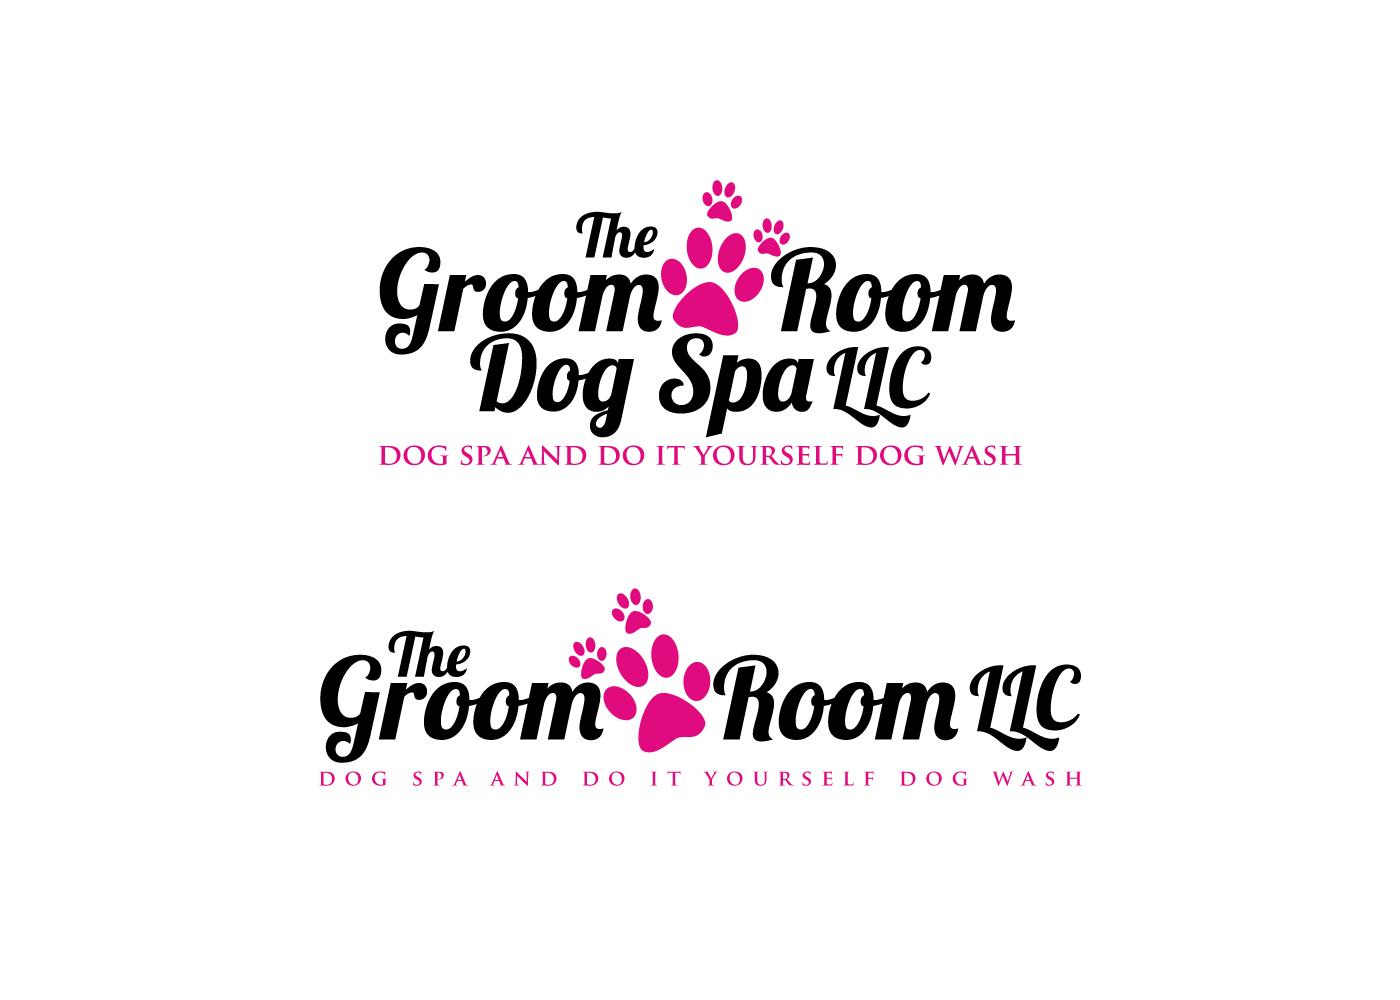 Elegant playful logo design for chickasha dog house by pixelart logo design by pixelart for the groom room llc dog spa and do it solutioingenieria Choice Image